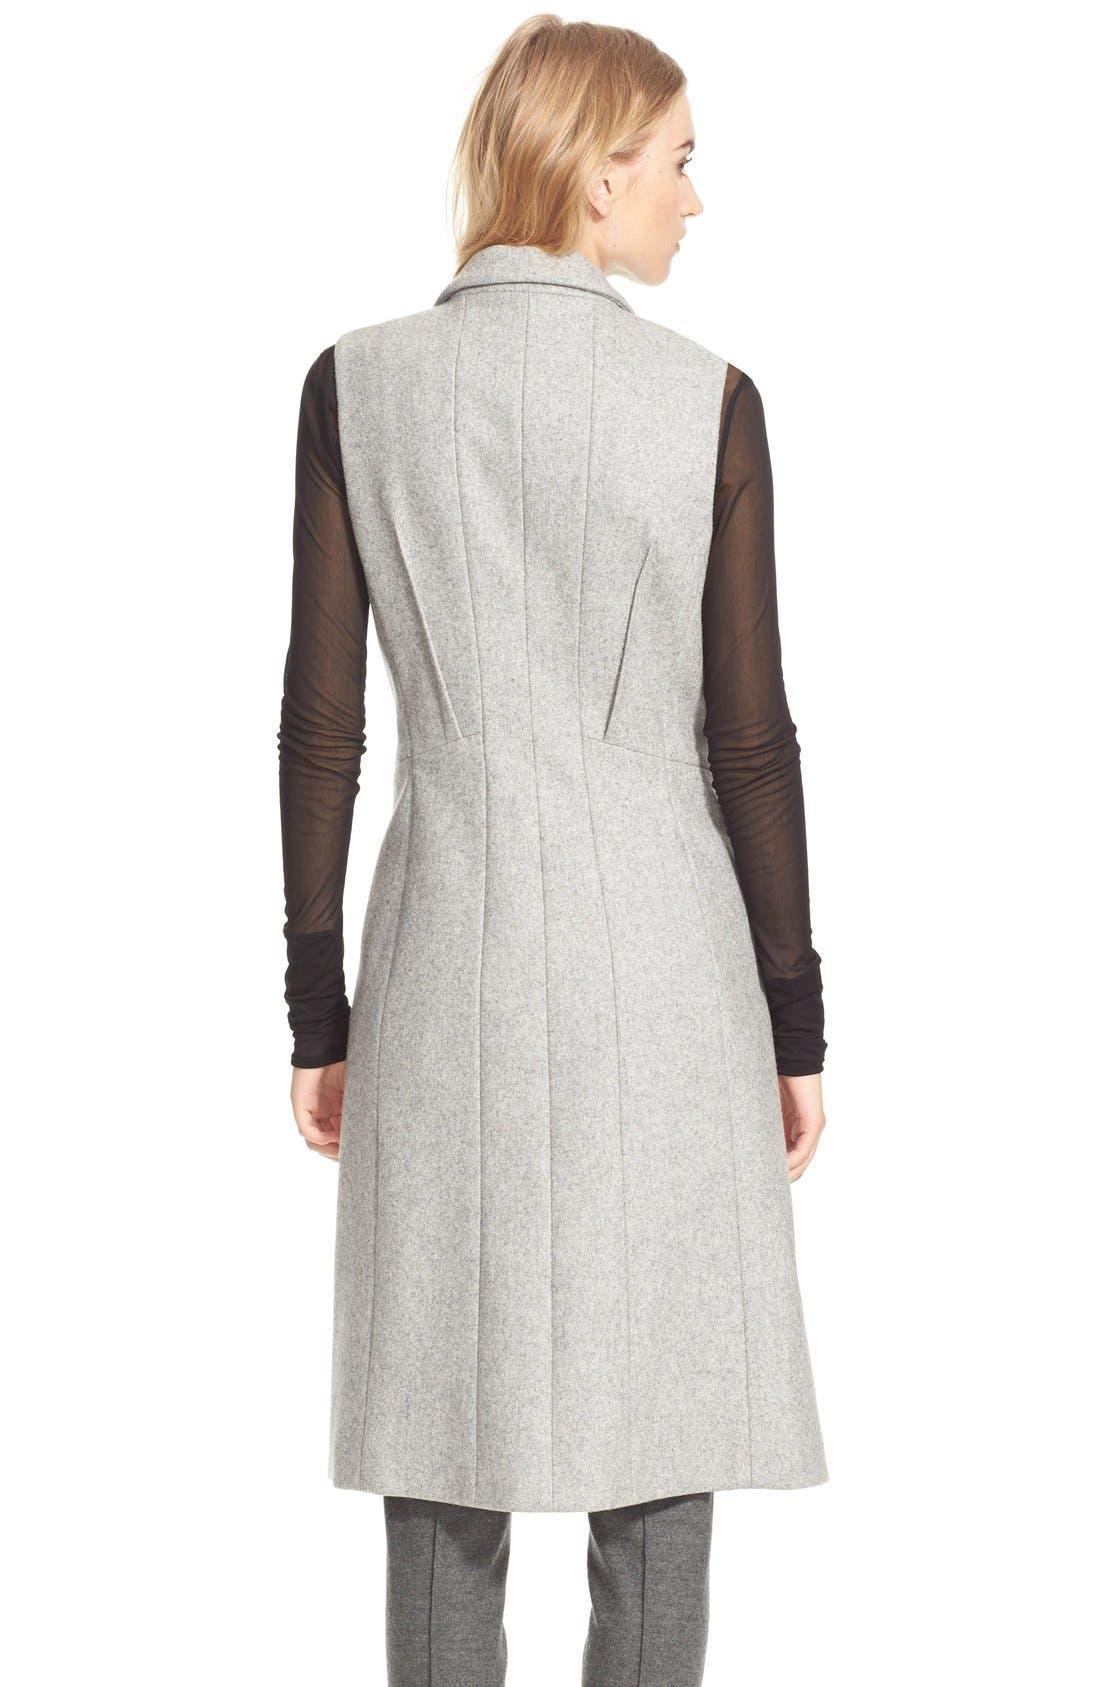 Alternate Image 2  - rag & bone 'Faye' Long Double Breasted Wool Blend Vest